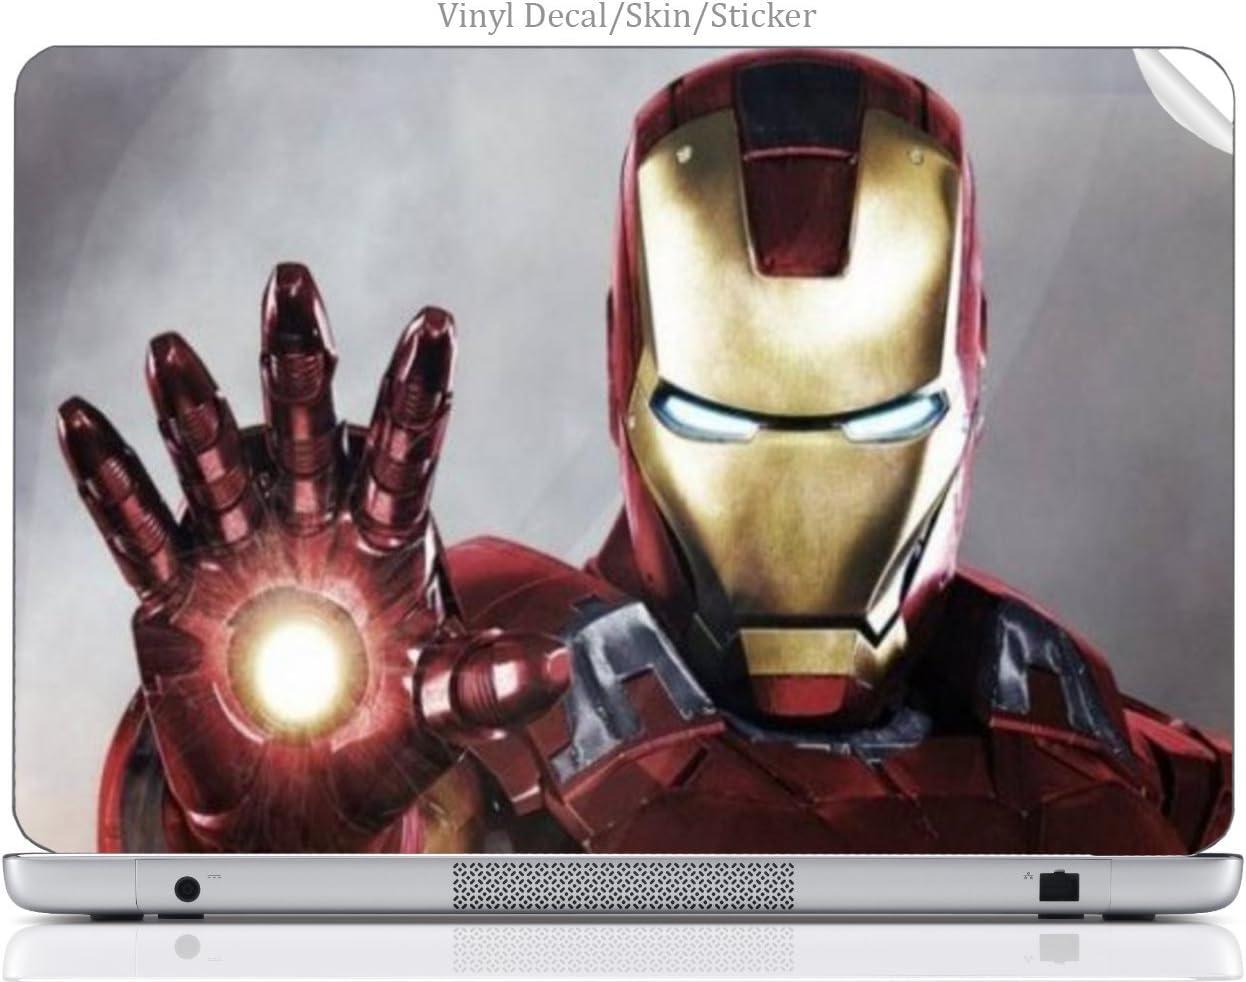 "Laptop VINYL DECAL Sticker Skin Print Comic Book Hero fits 15.6"" Laptop (15-d038dx)"